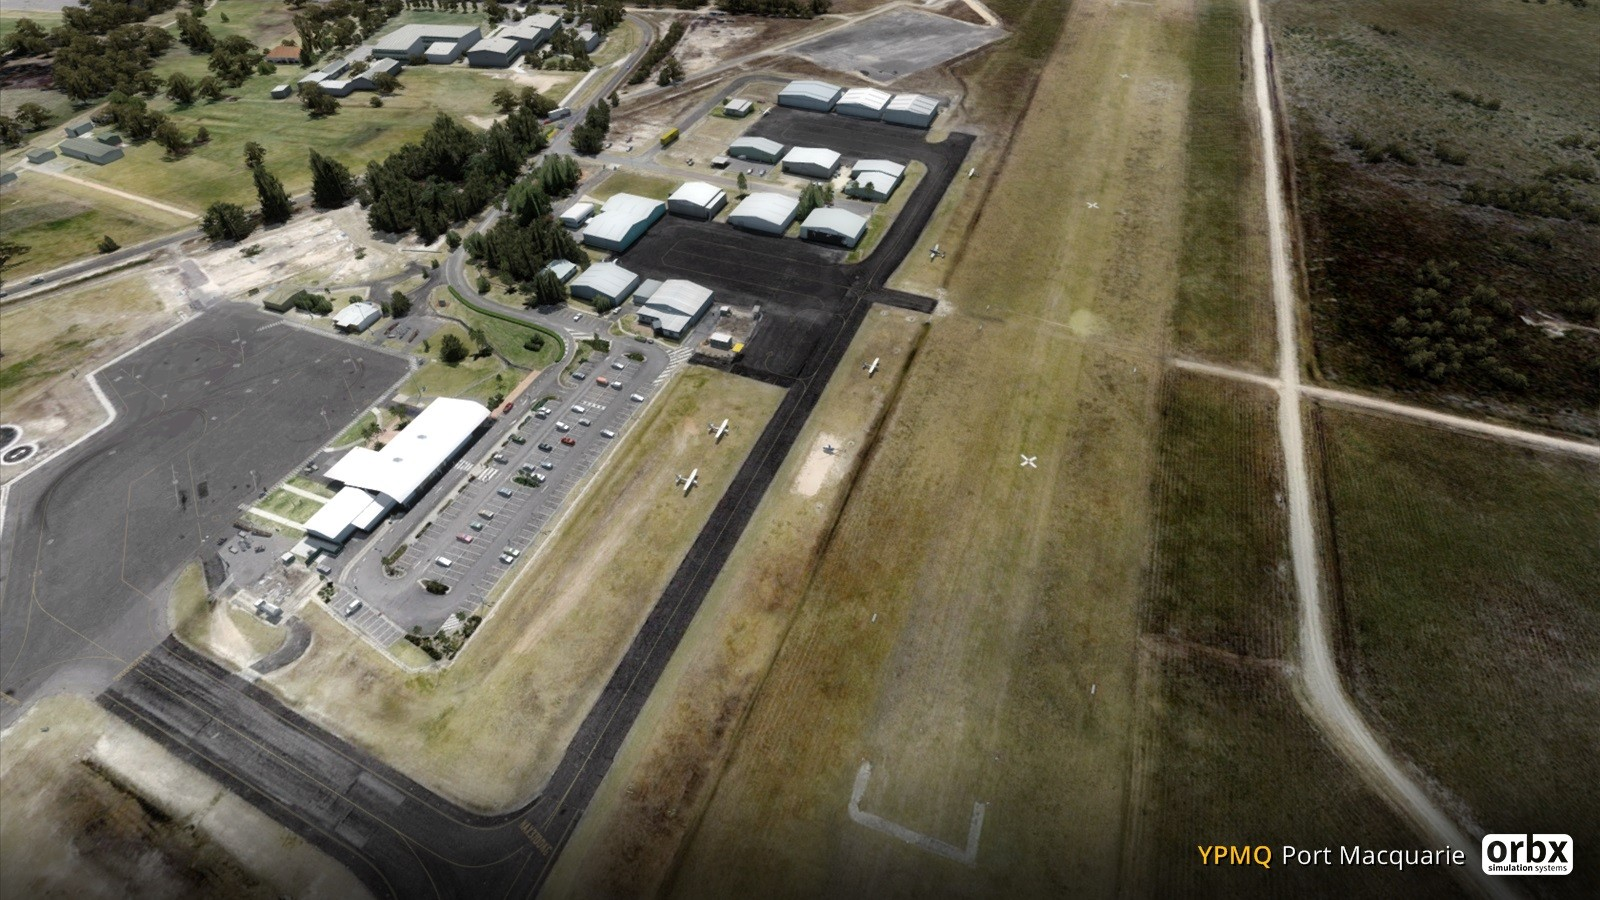 YPMQ Port Macquarie Airport